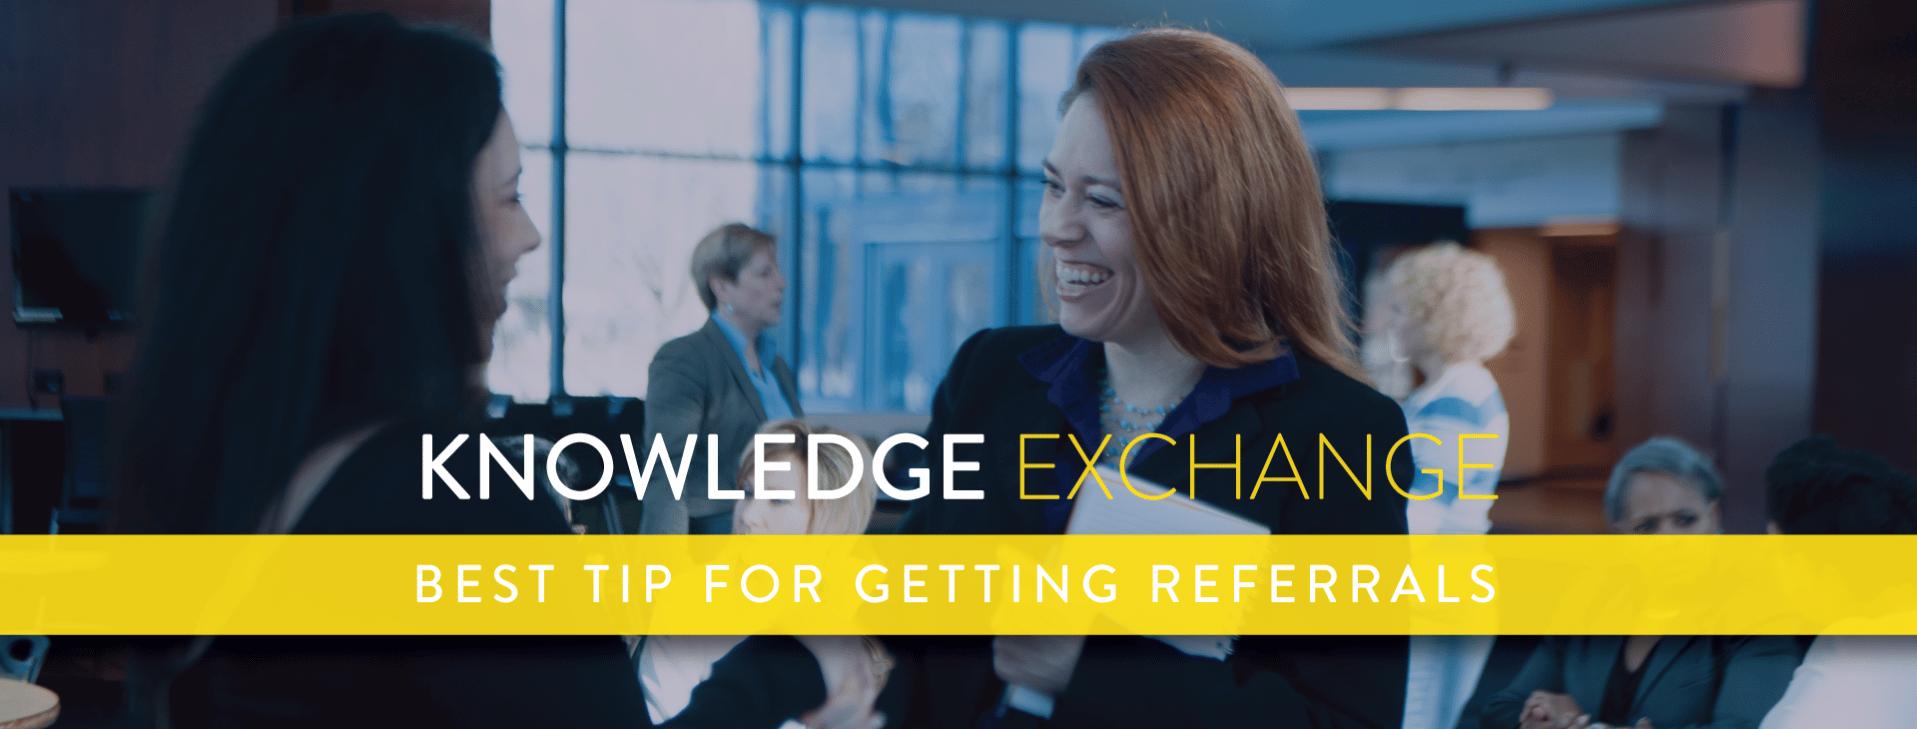 knowledge exchange graphic